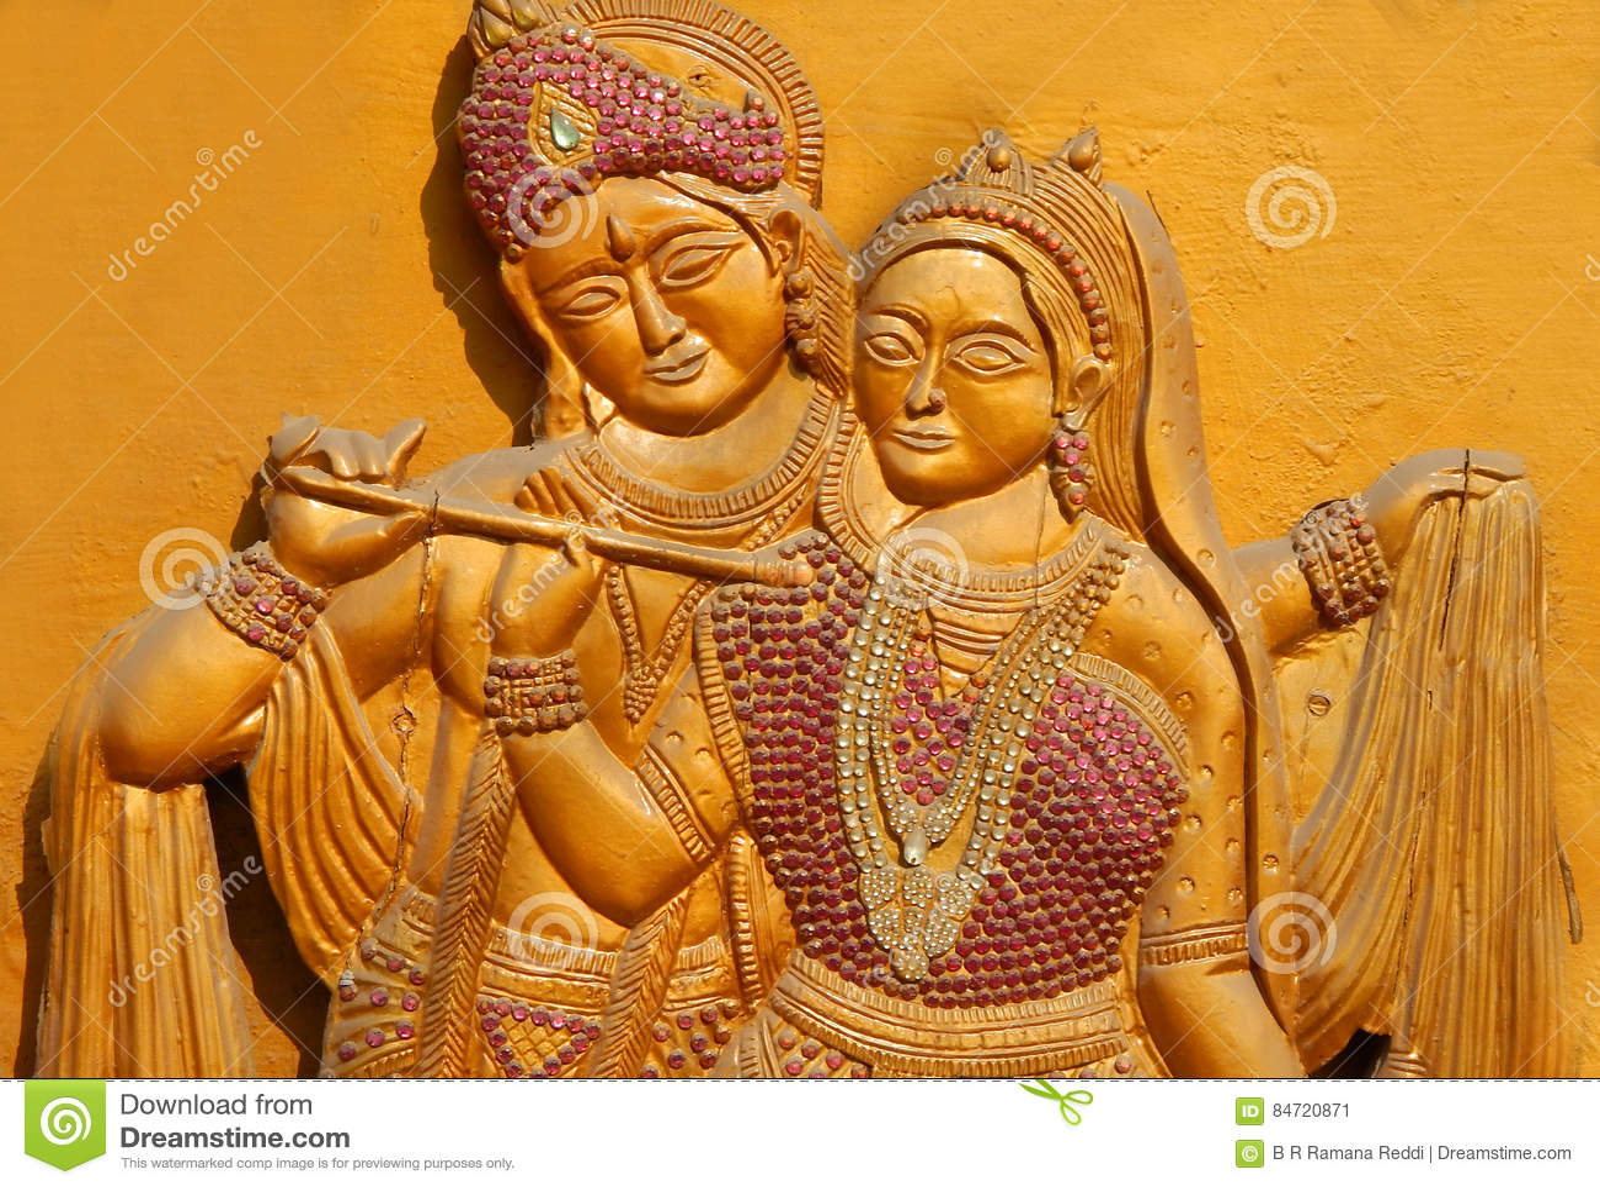 mahabharat krishna song download